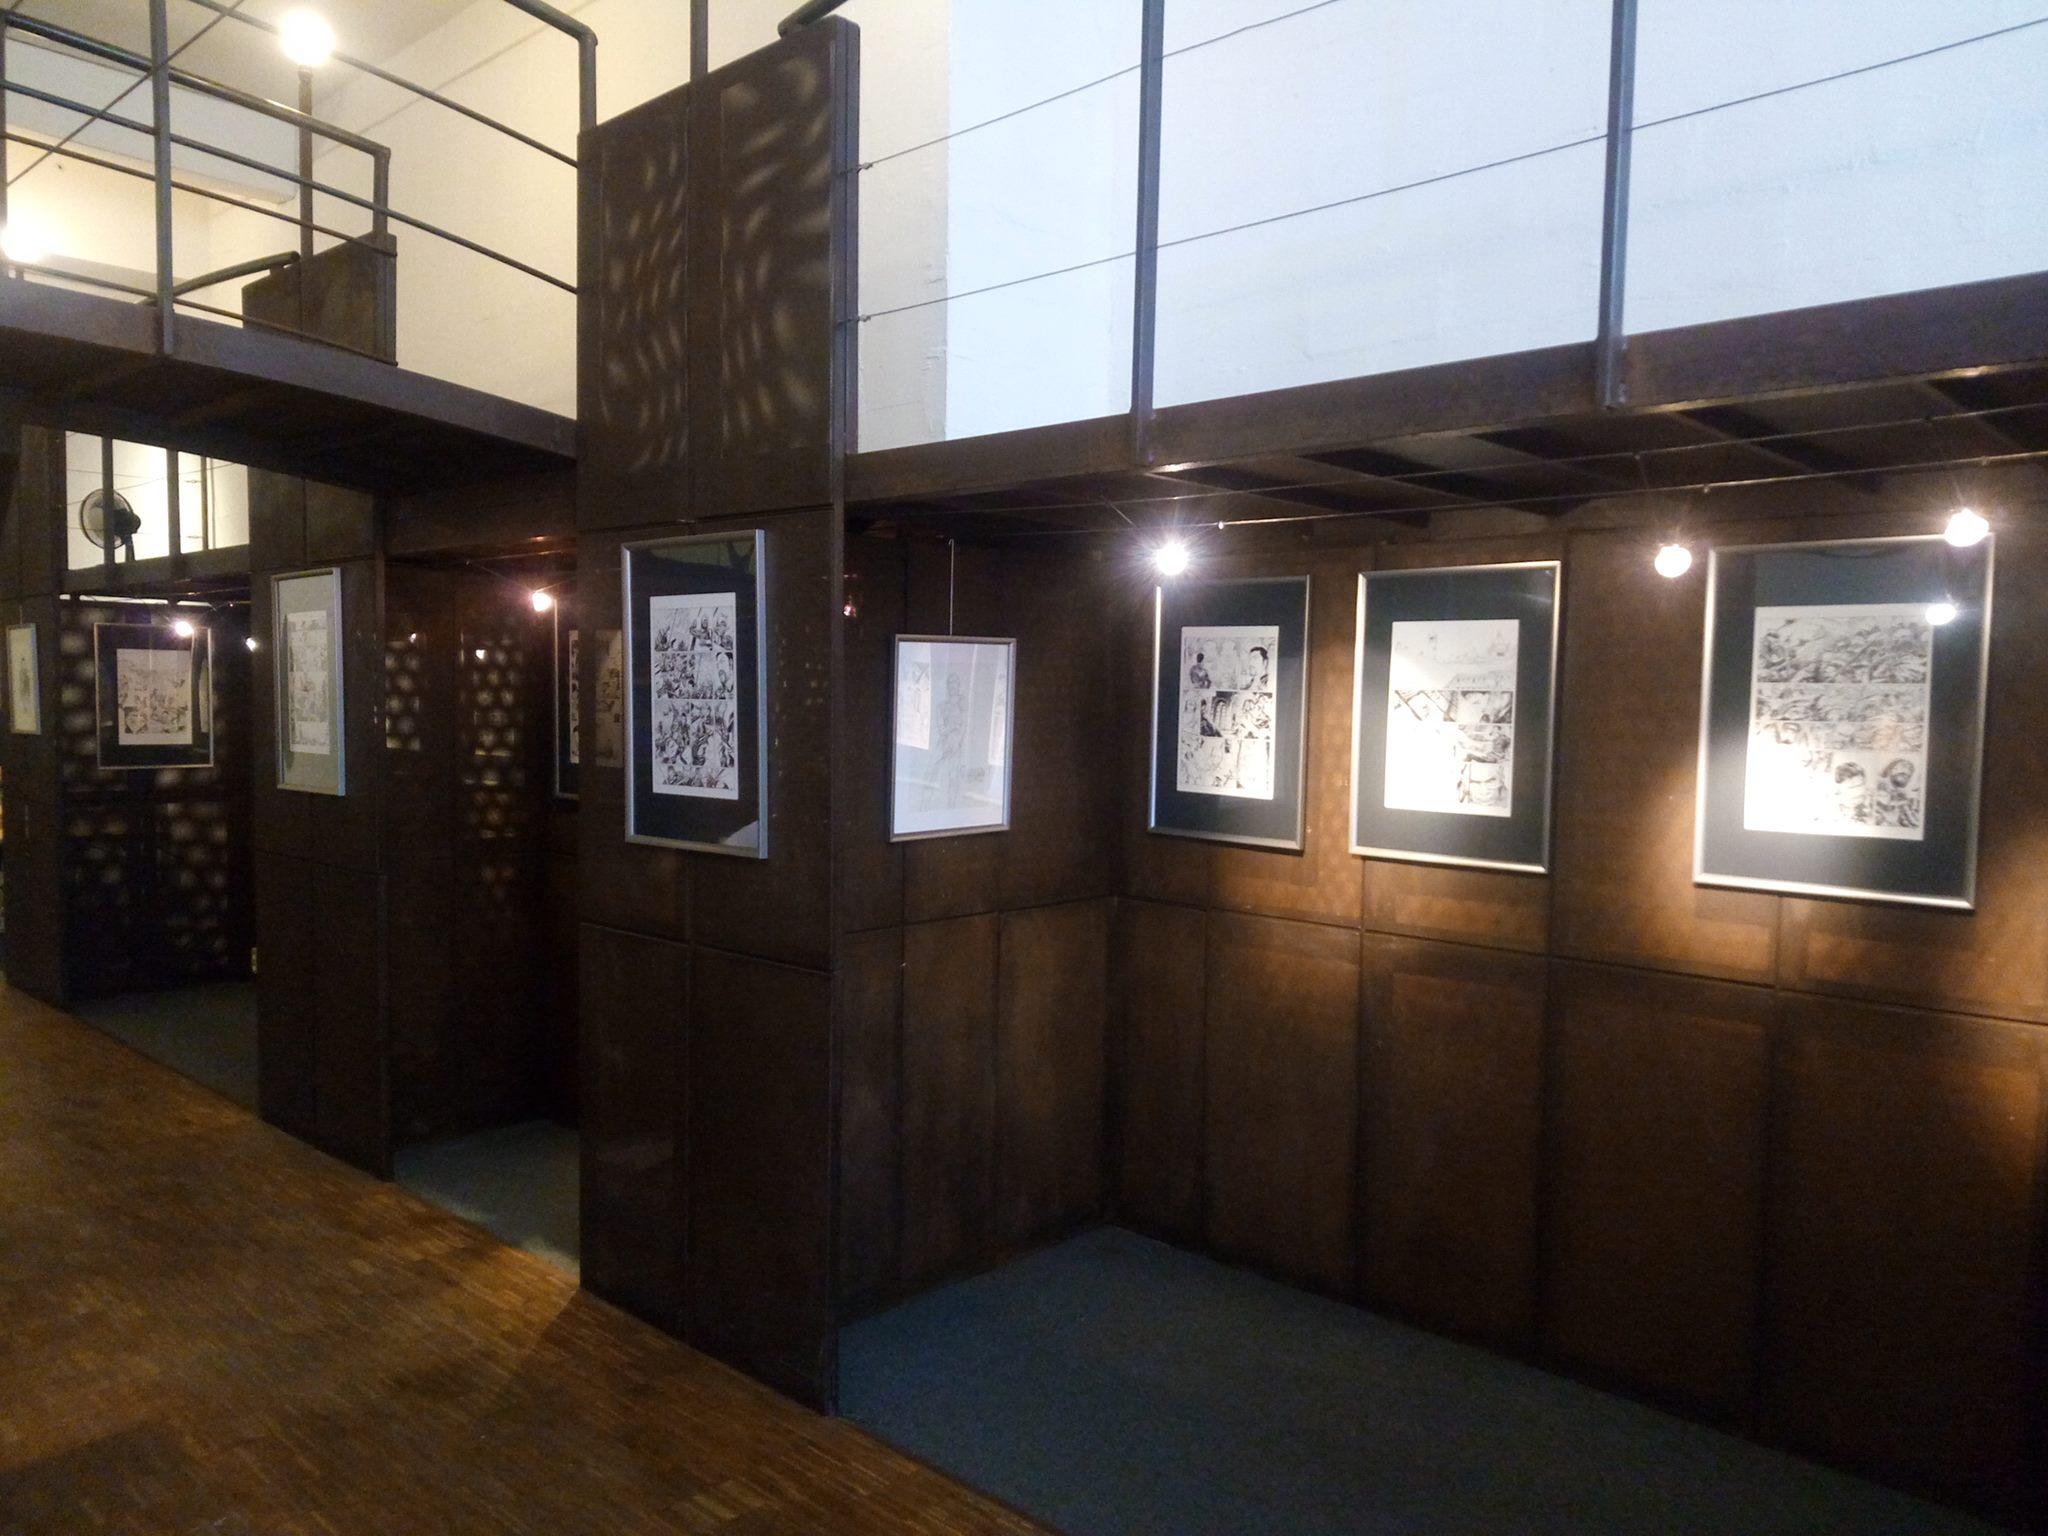 Galerie Passerelle Louise 6 juin 2018  1